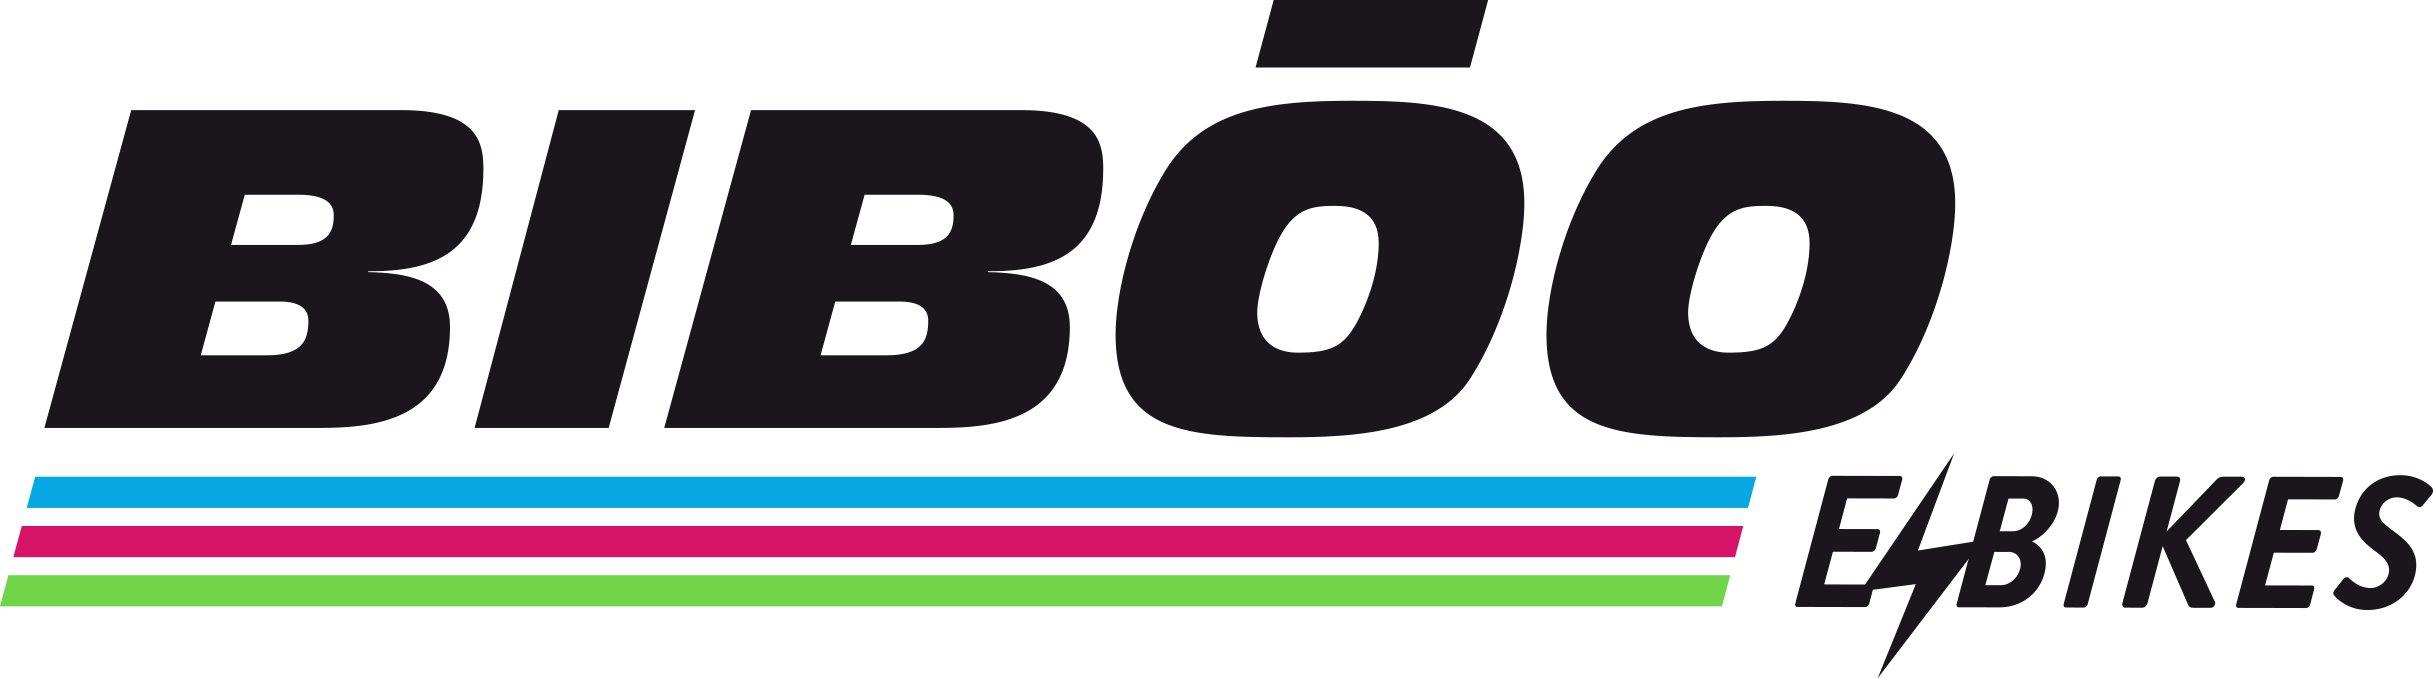 logo-biboo_e-bikes_negro